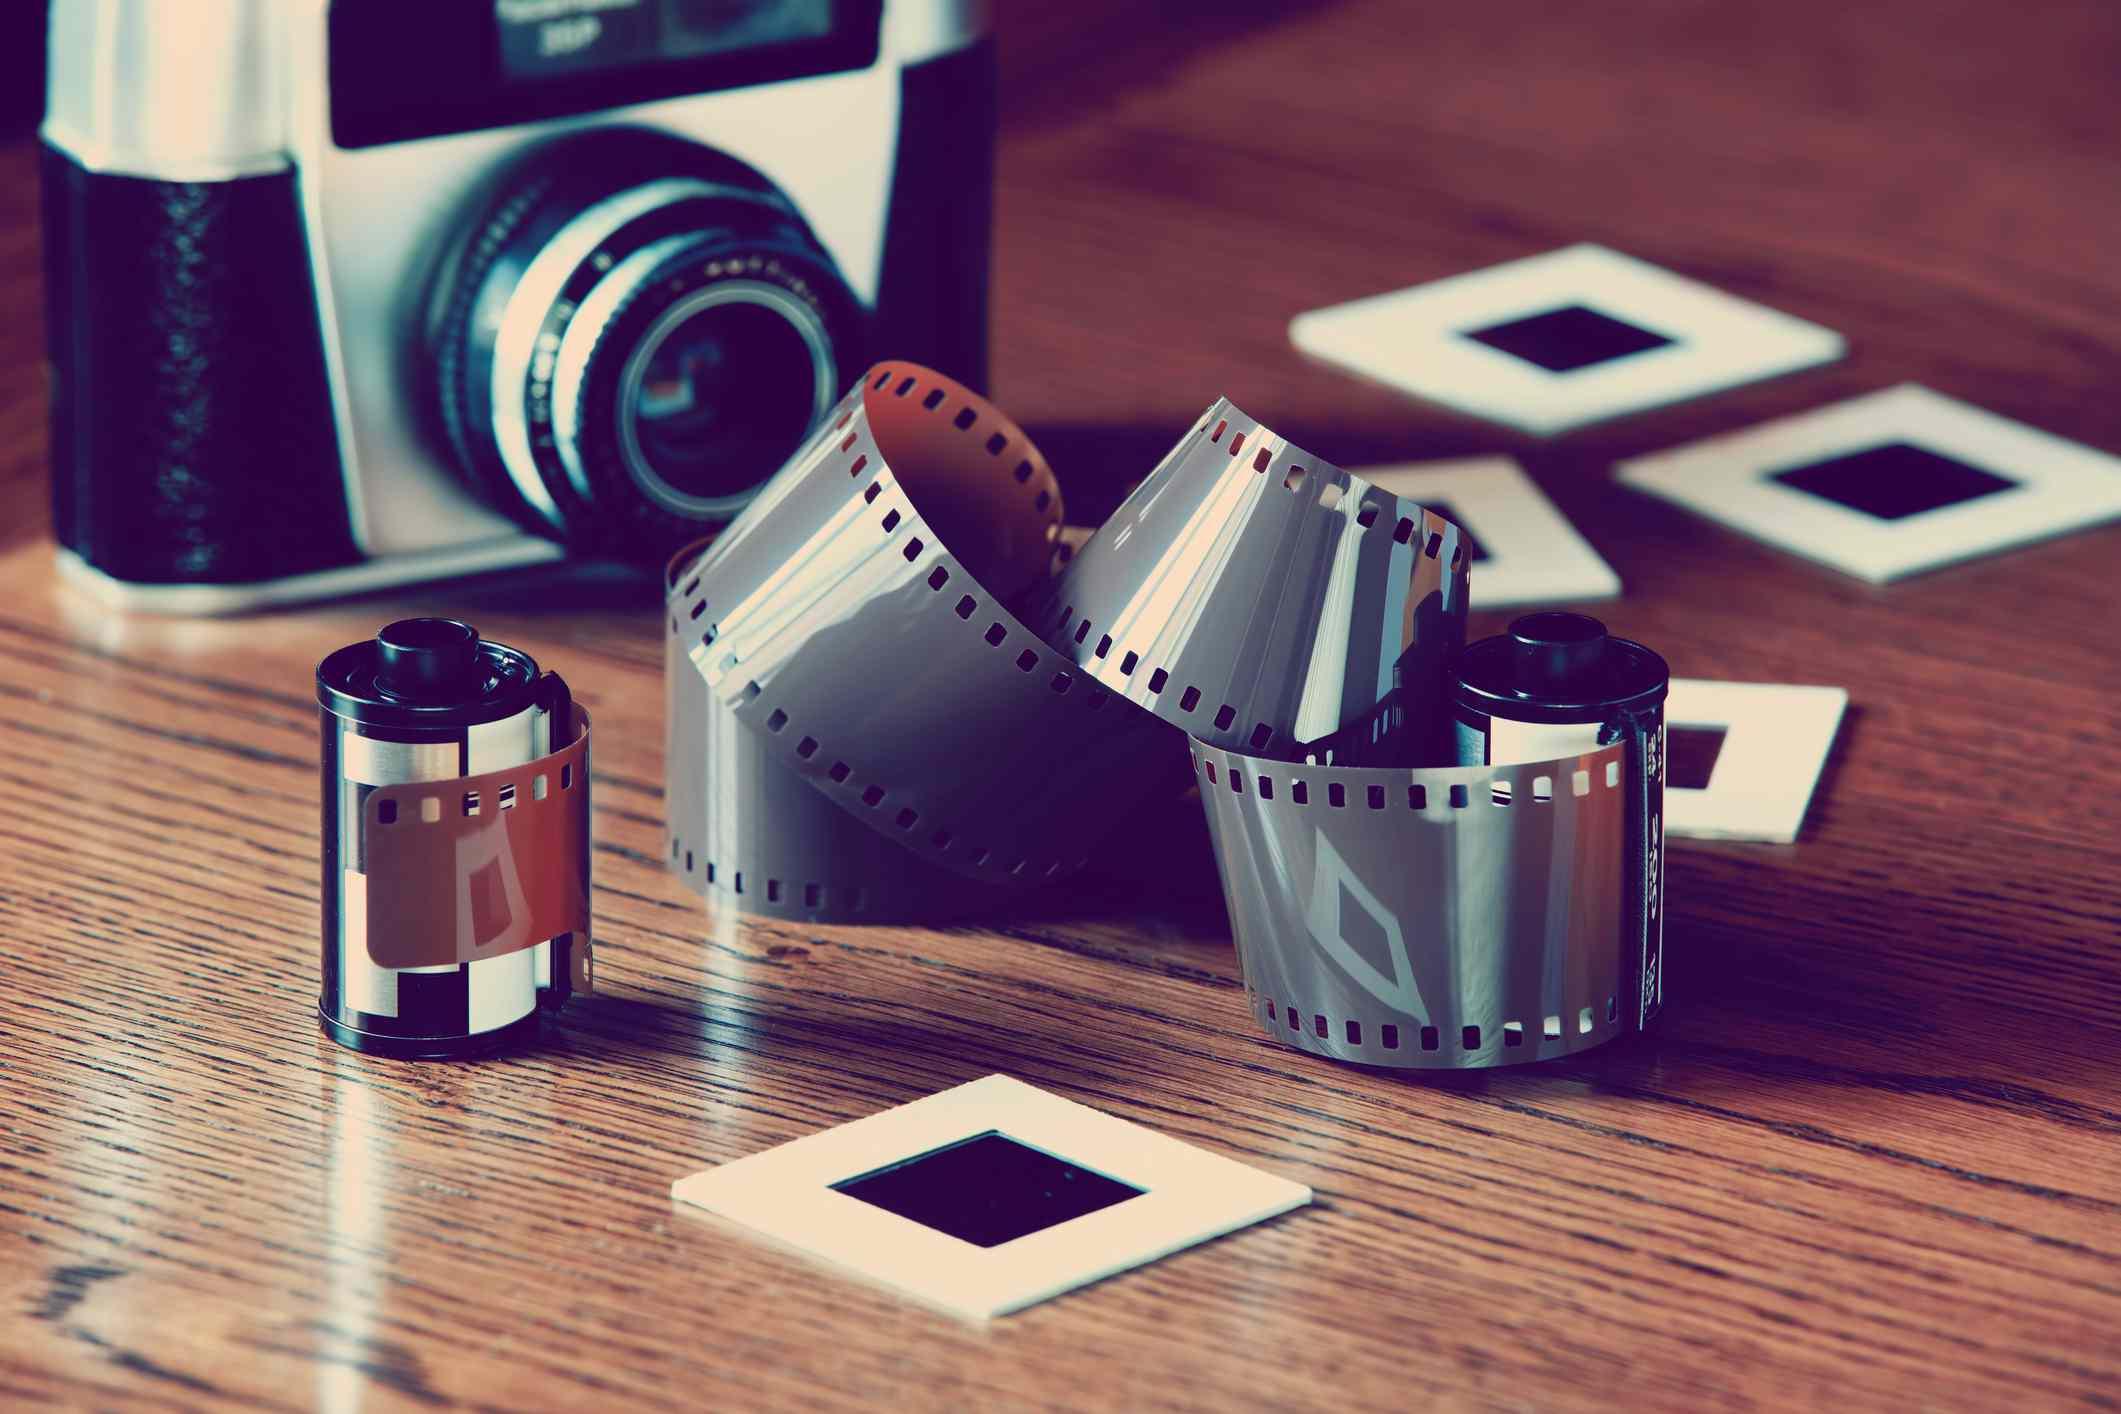 Unwound camera film, slides and camera